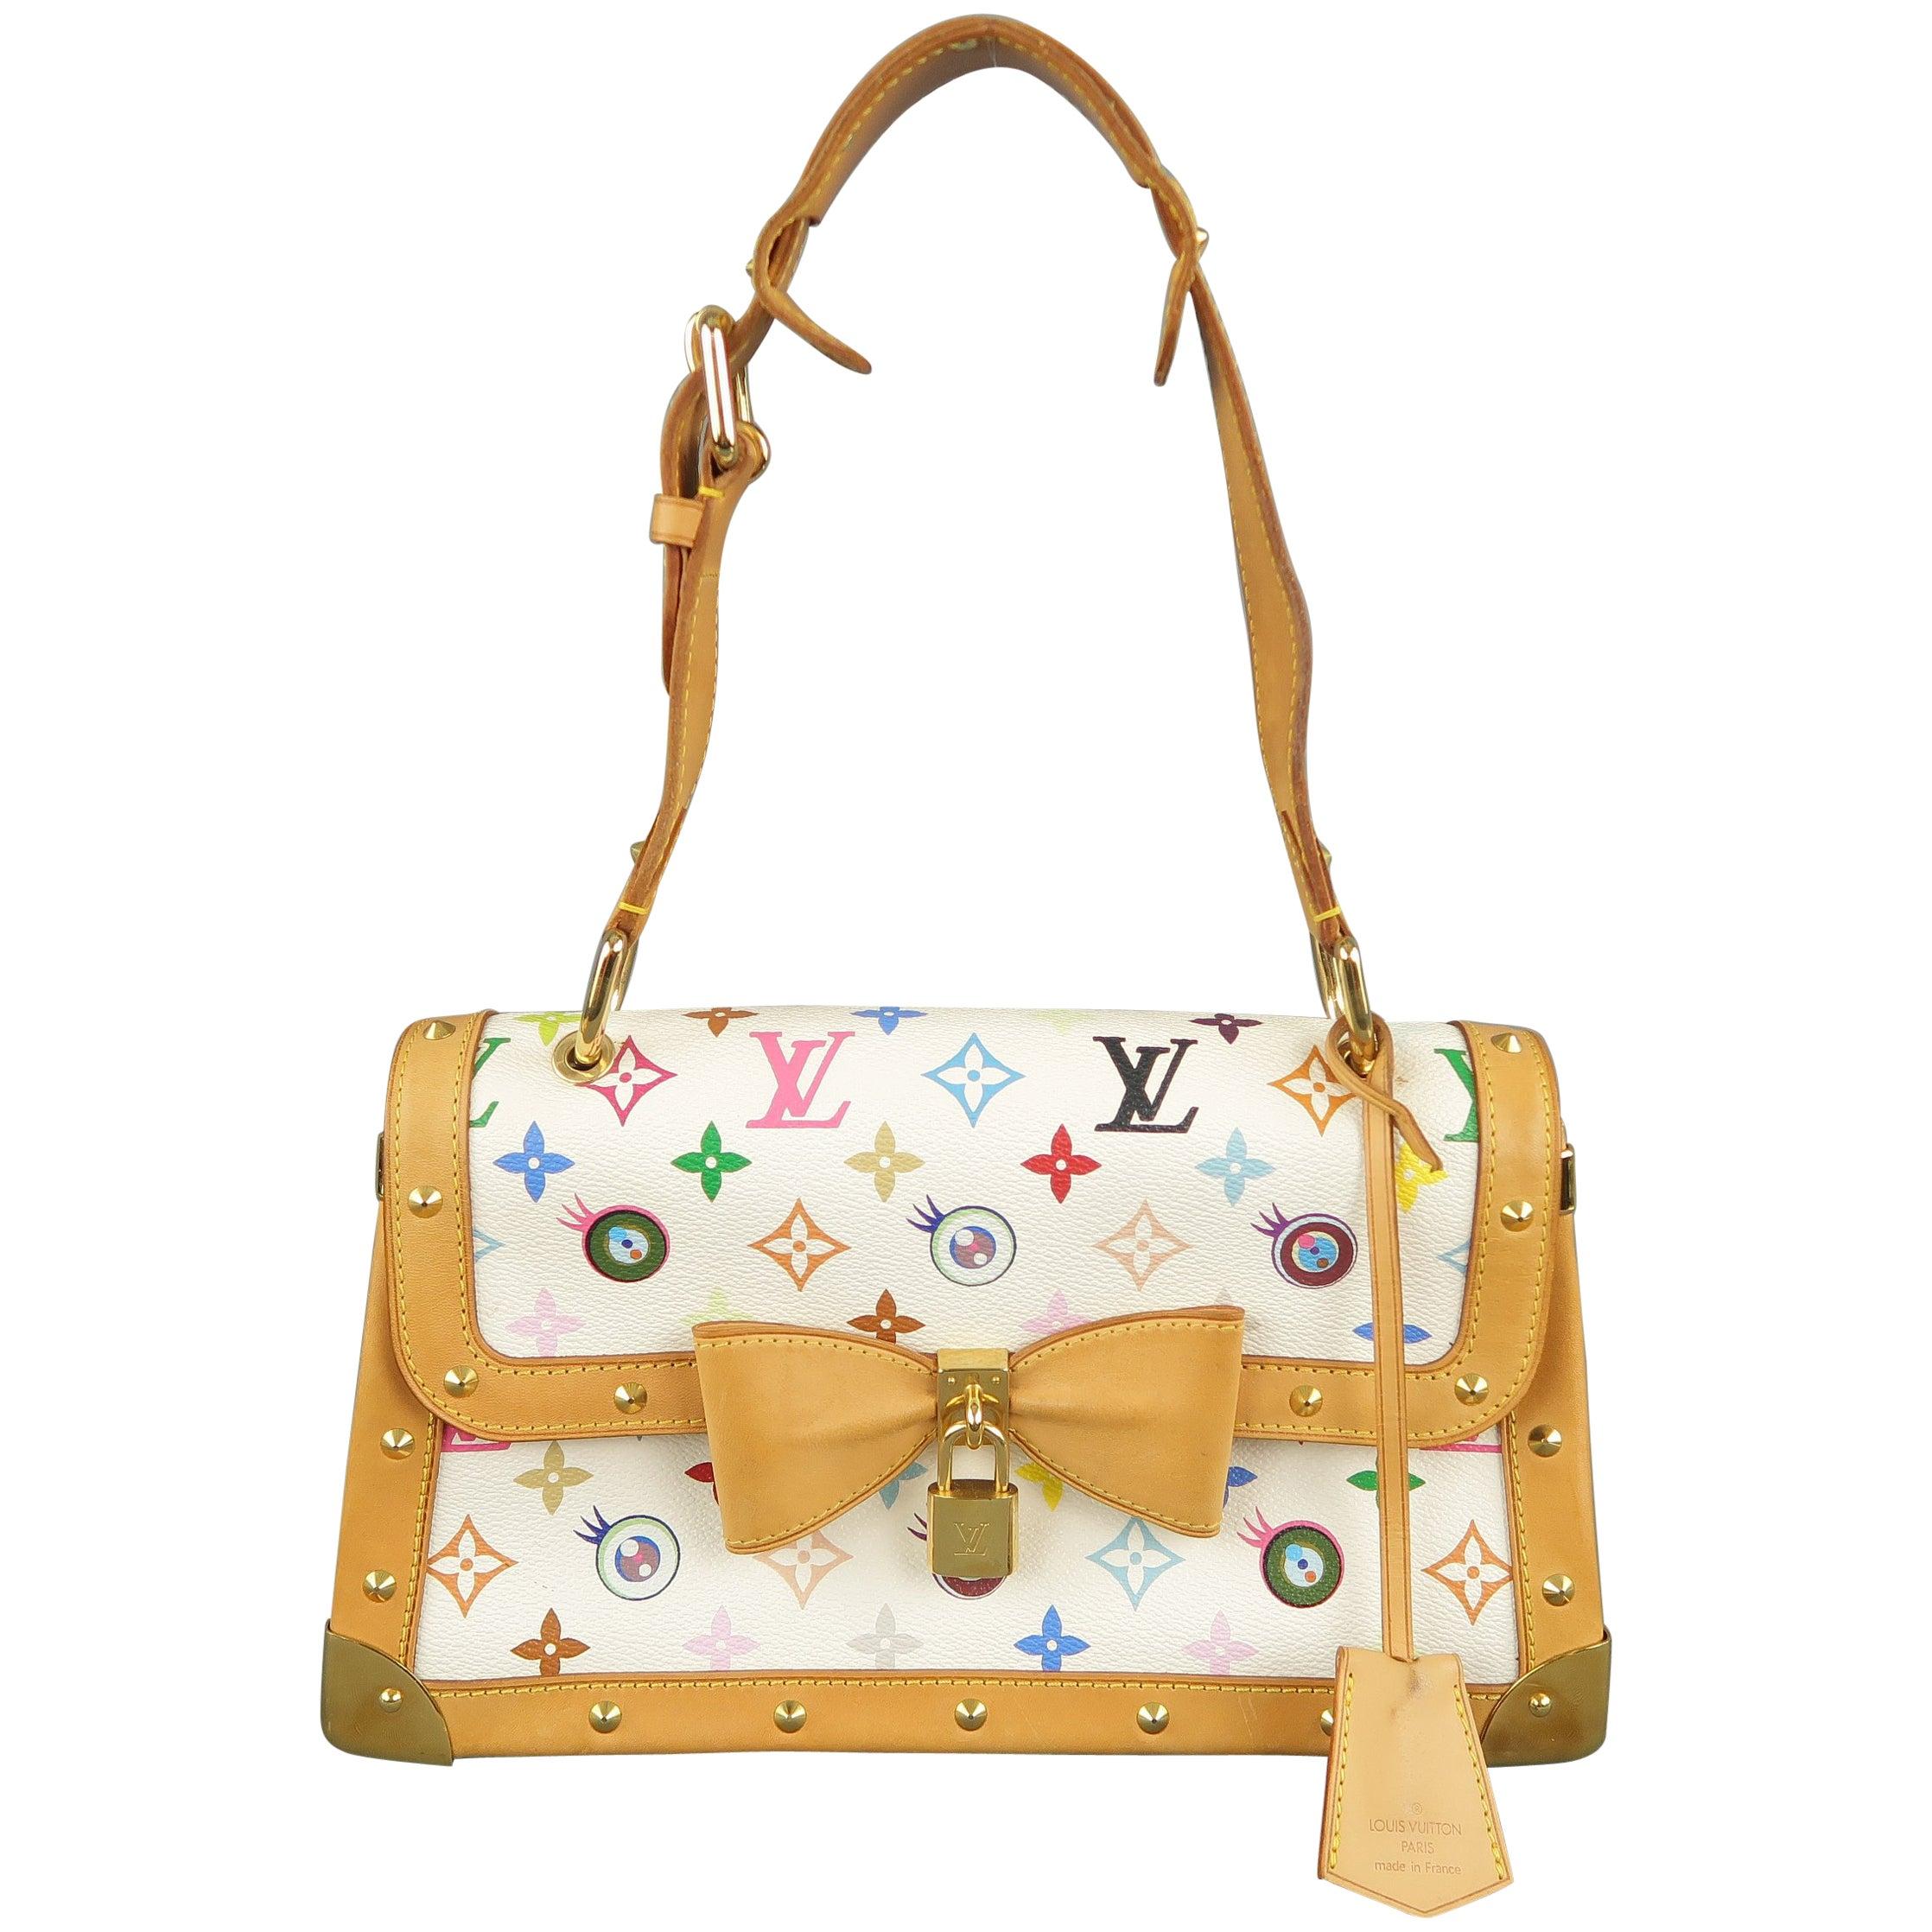 fd426c68de74 LOUIS VUITTON x Takashi Murakami White Multicolor Monogram EYE NEED YOU Bag  For Sale at 1stdibs